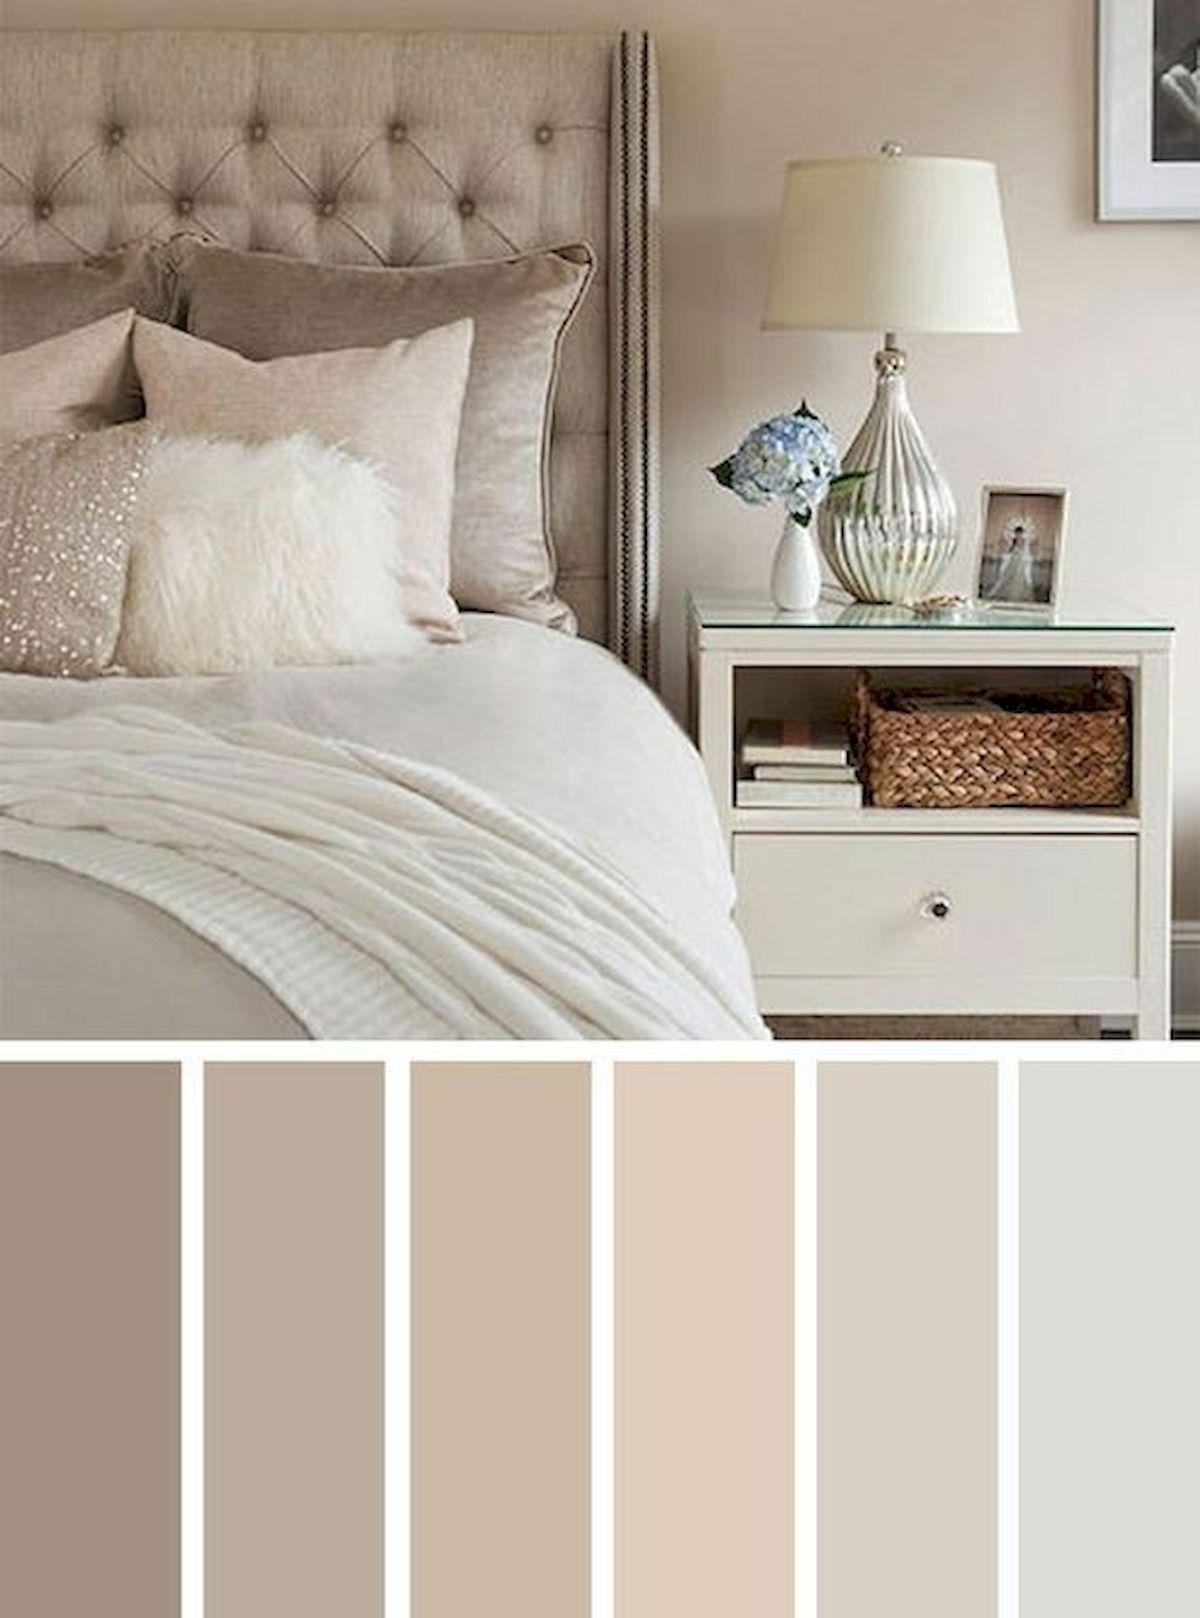 40 Beautiful Bedroom Color Schemes Ideas #livingroomcolorschemeideas